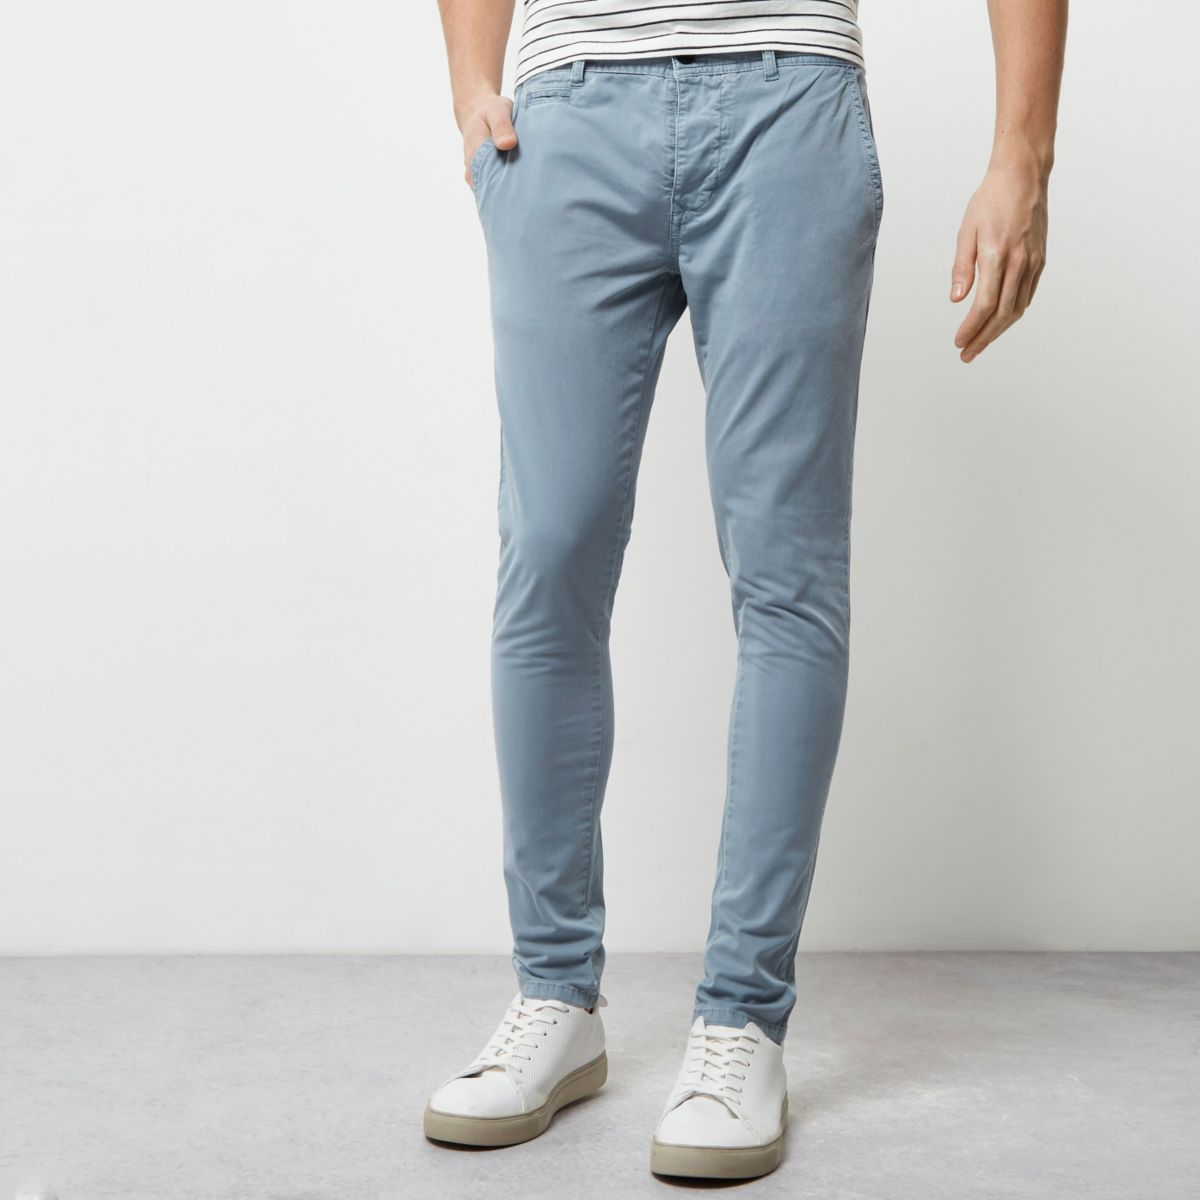 pantalon chino super skinny stretch bleu pantalons promo homme. Black Bedroom Furniture Sets. Home Design Ideas